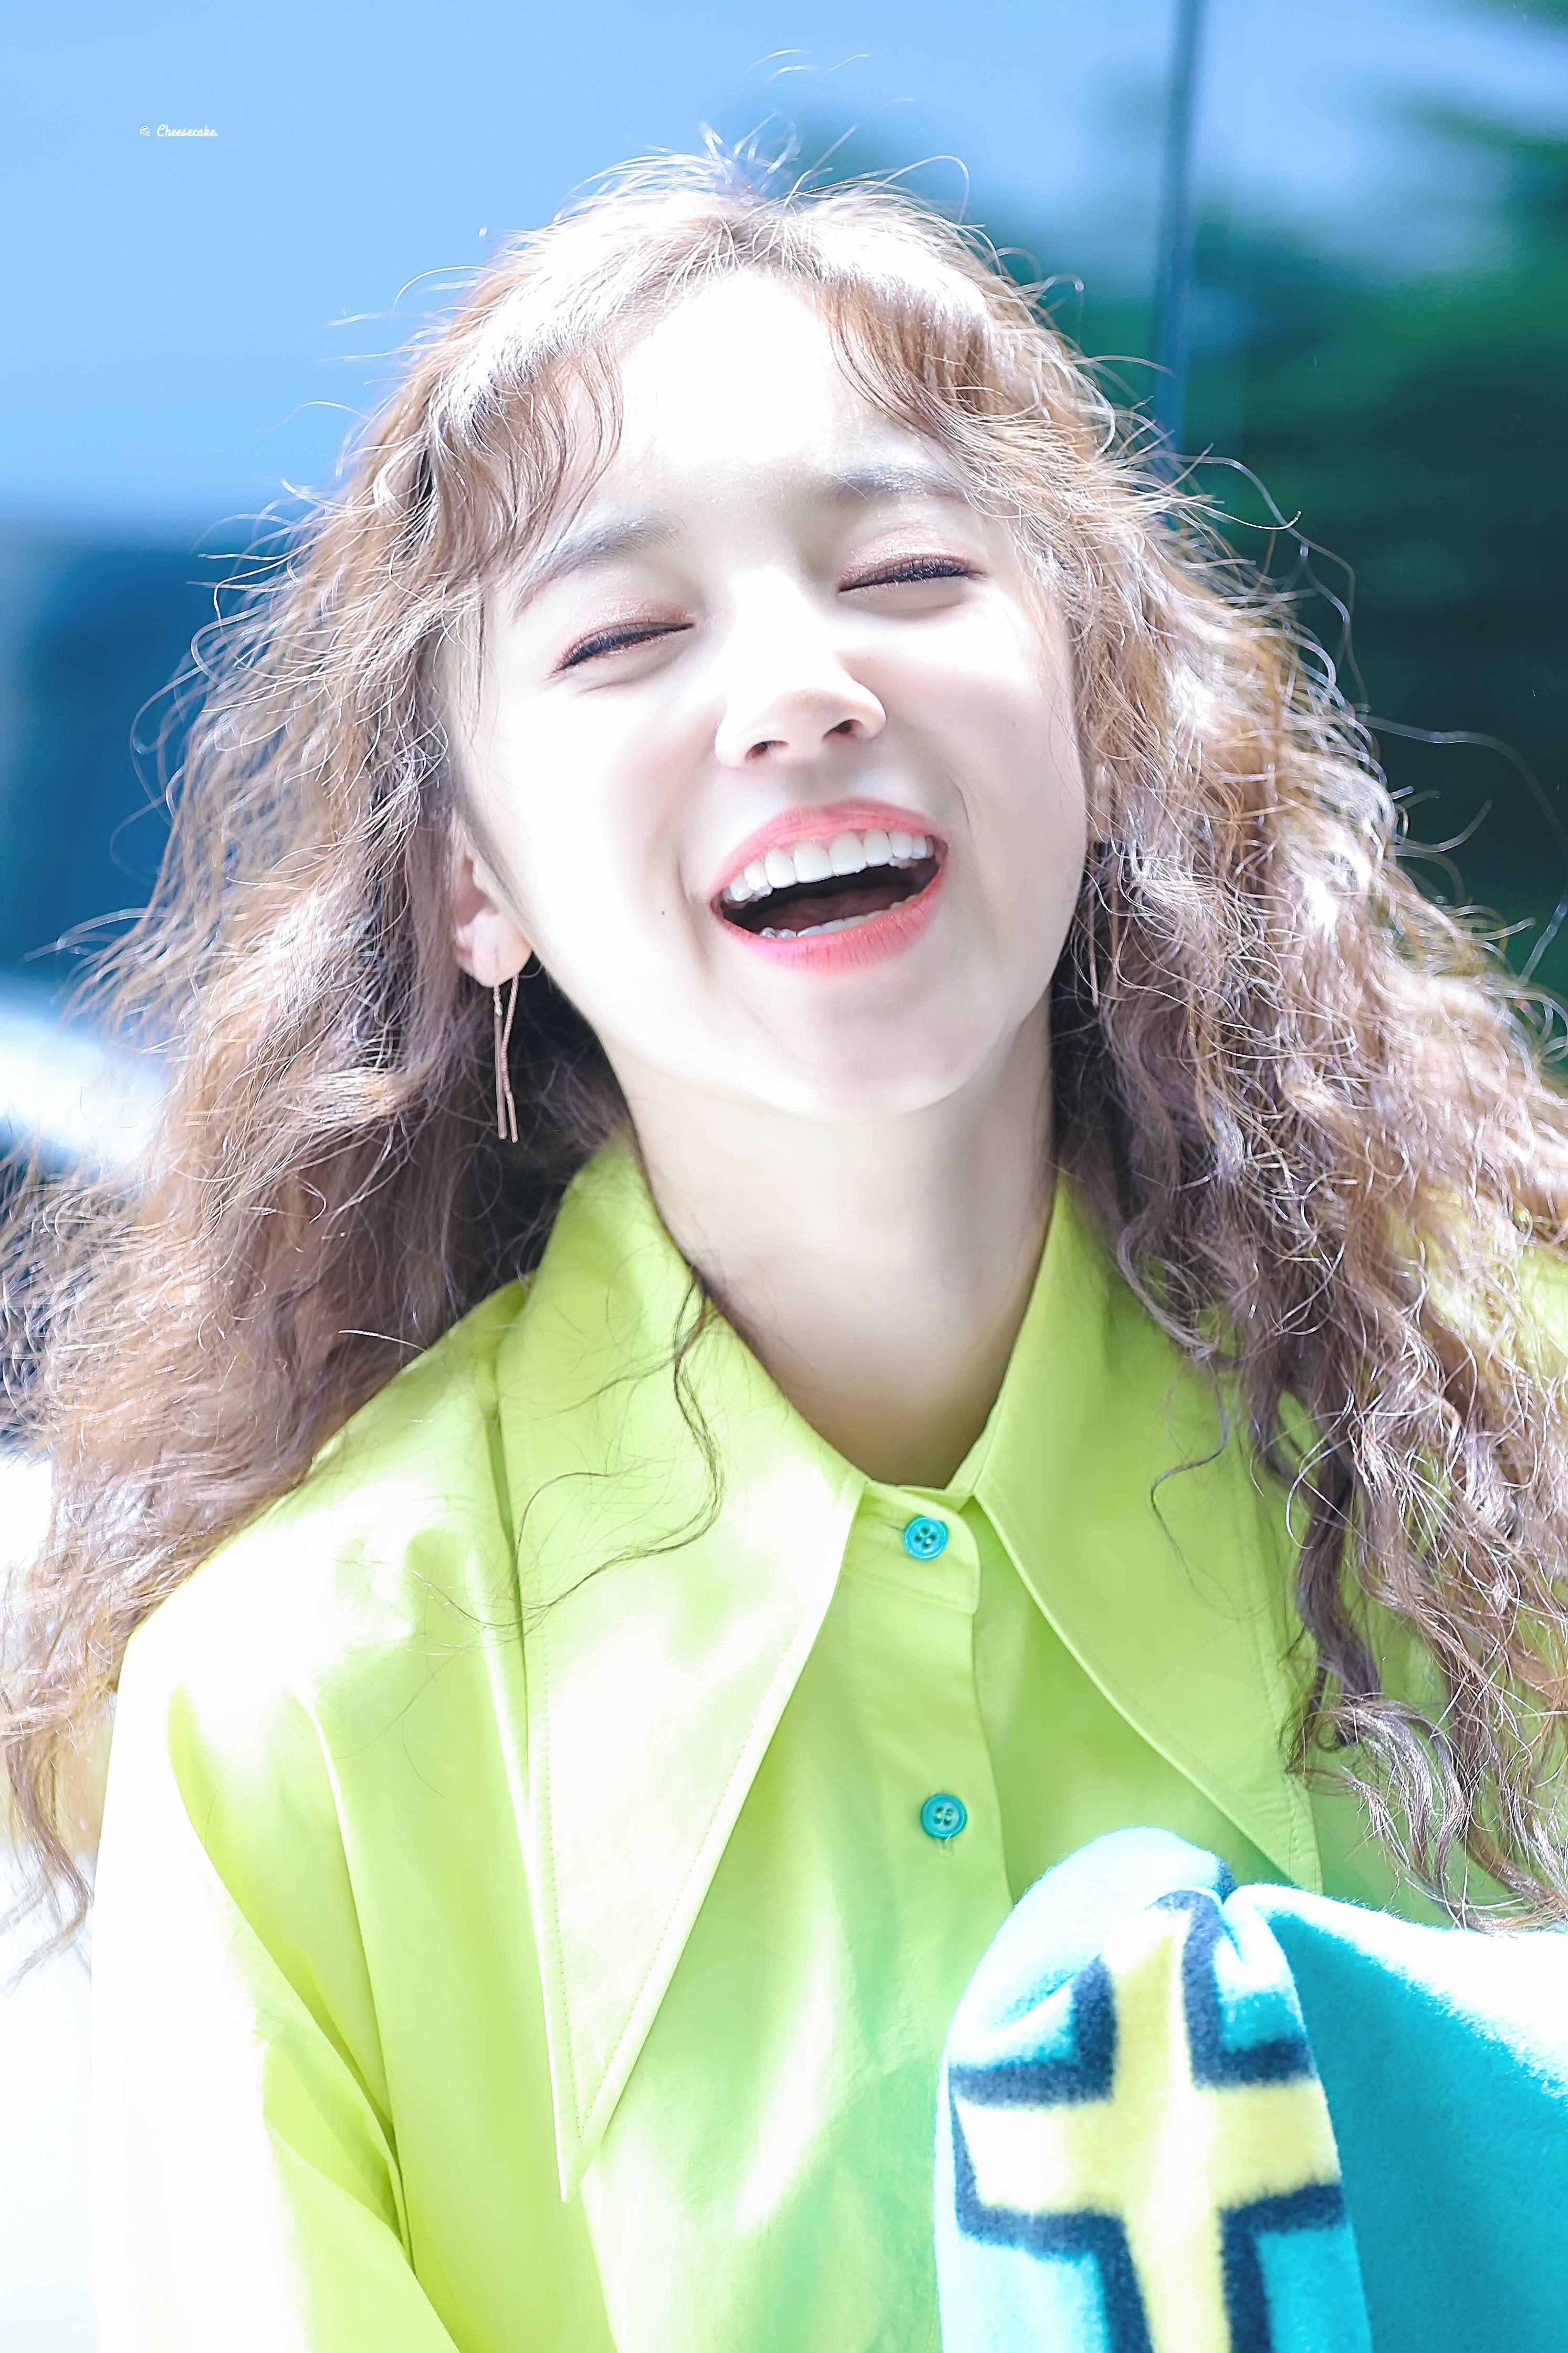 Weareoneidols Aweh She S So Beautiful N Happy Mid Laugh Yuqi Gidle Laugh Laughing Pose Kpop Girlgroup Gambar